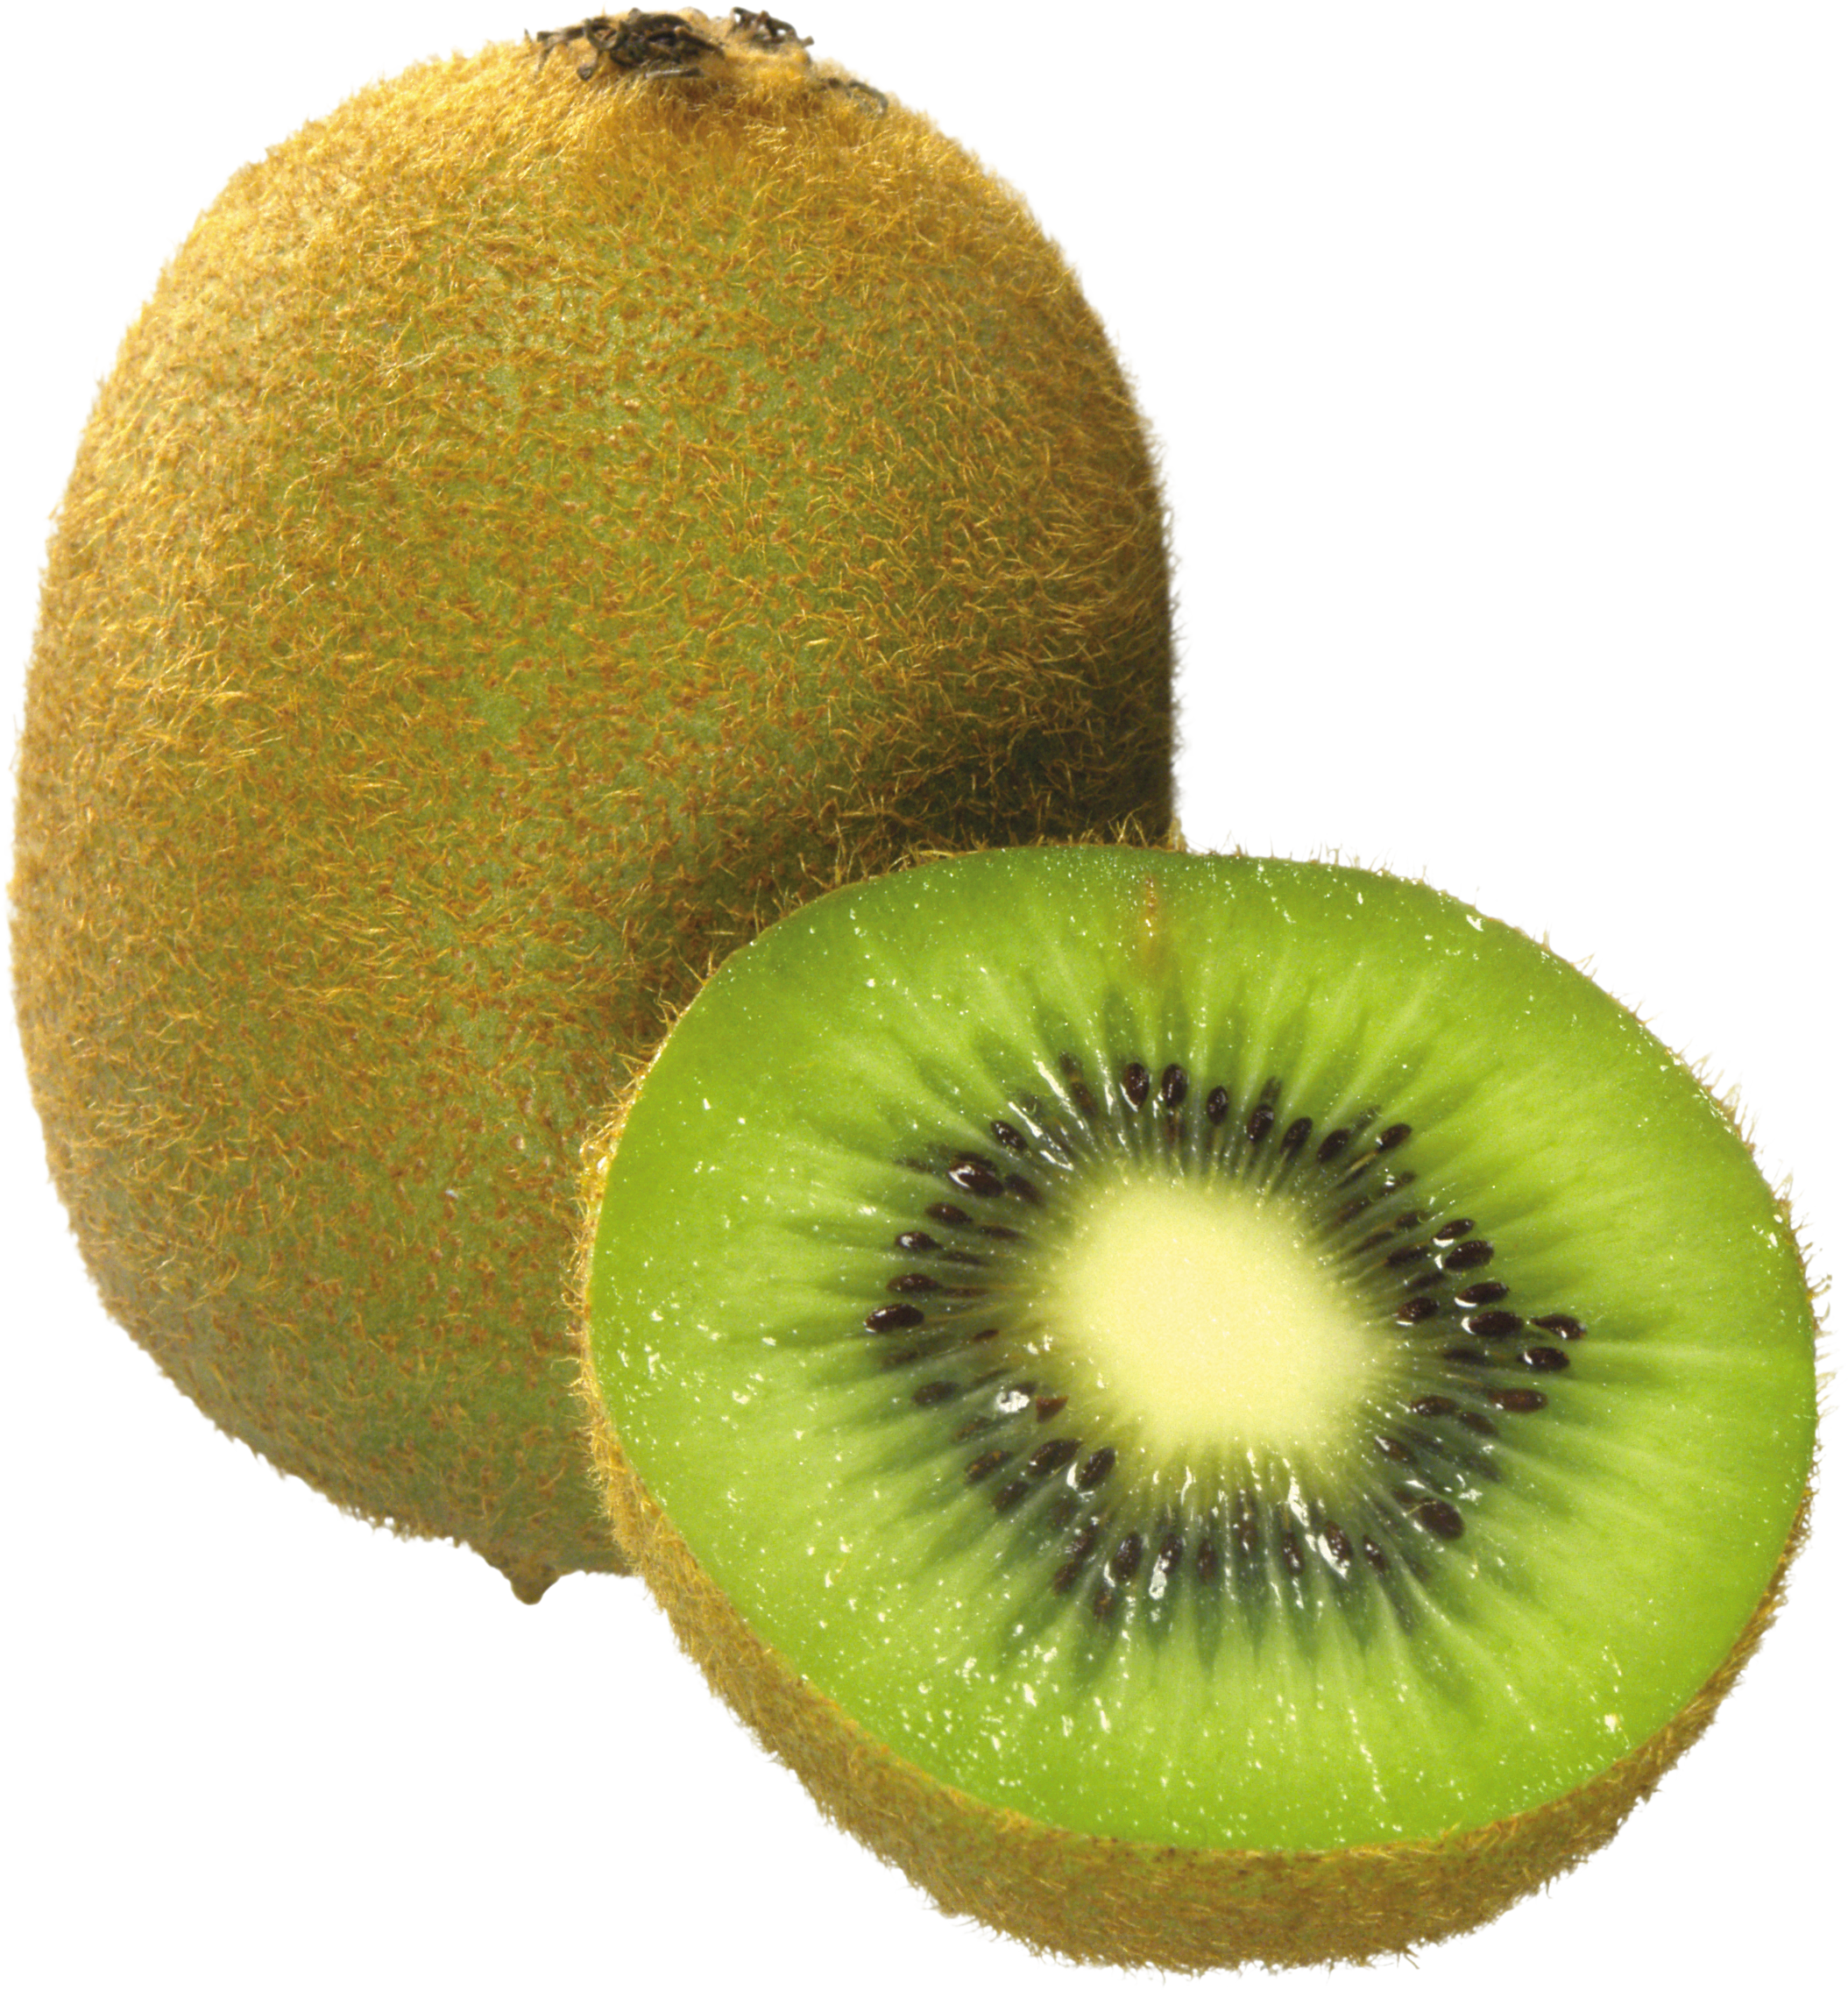 Coloriage Kiwi Fruit.Coloriage Kiwi A Imprimer